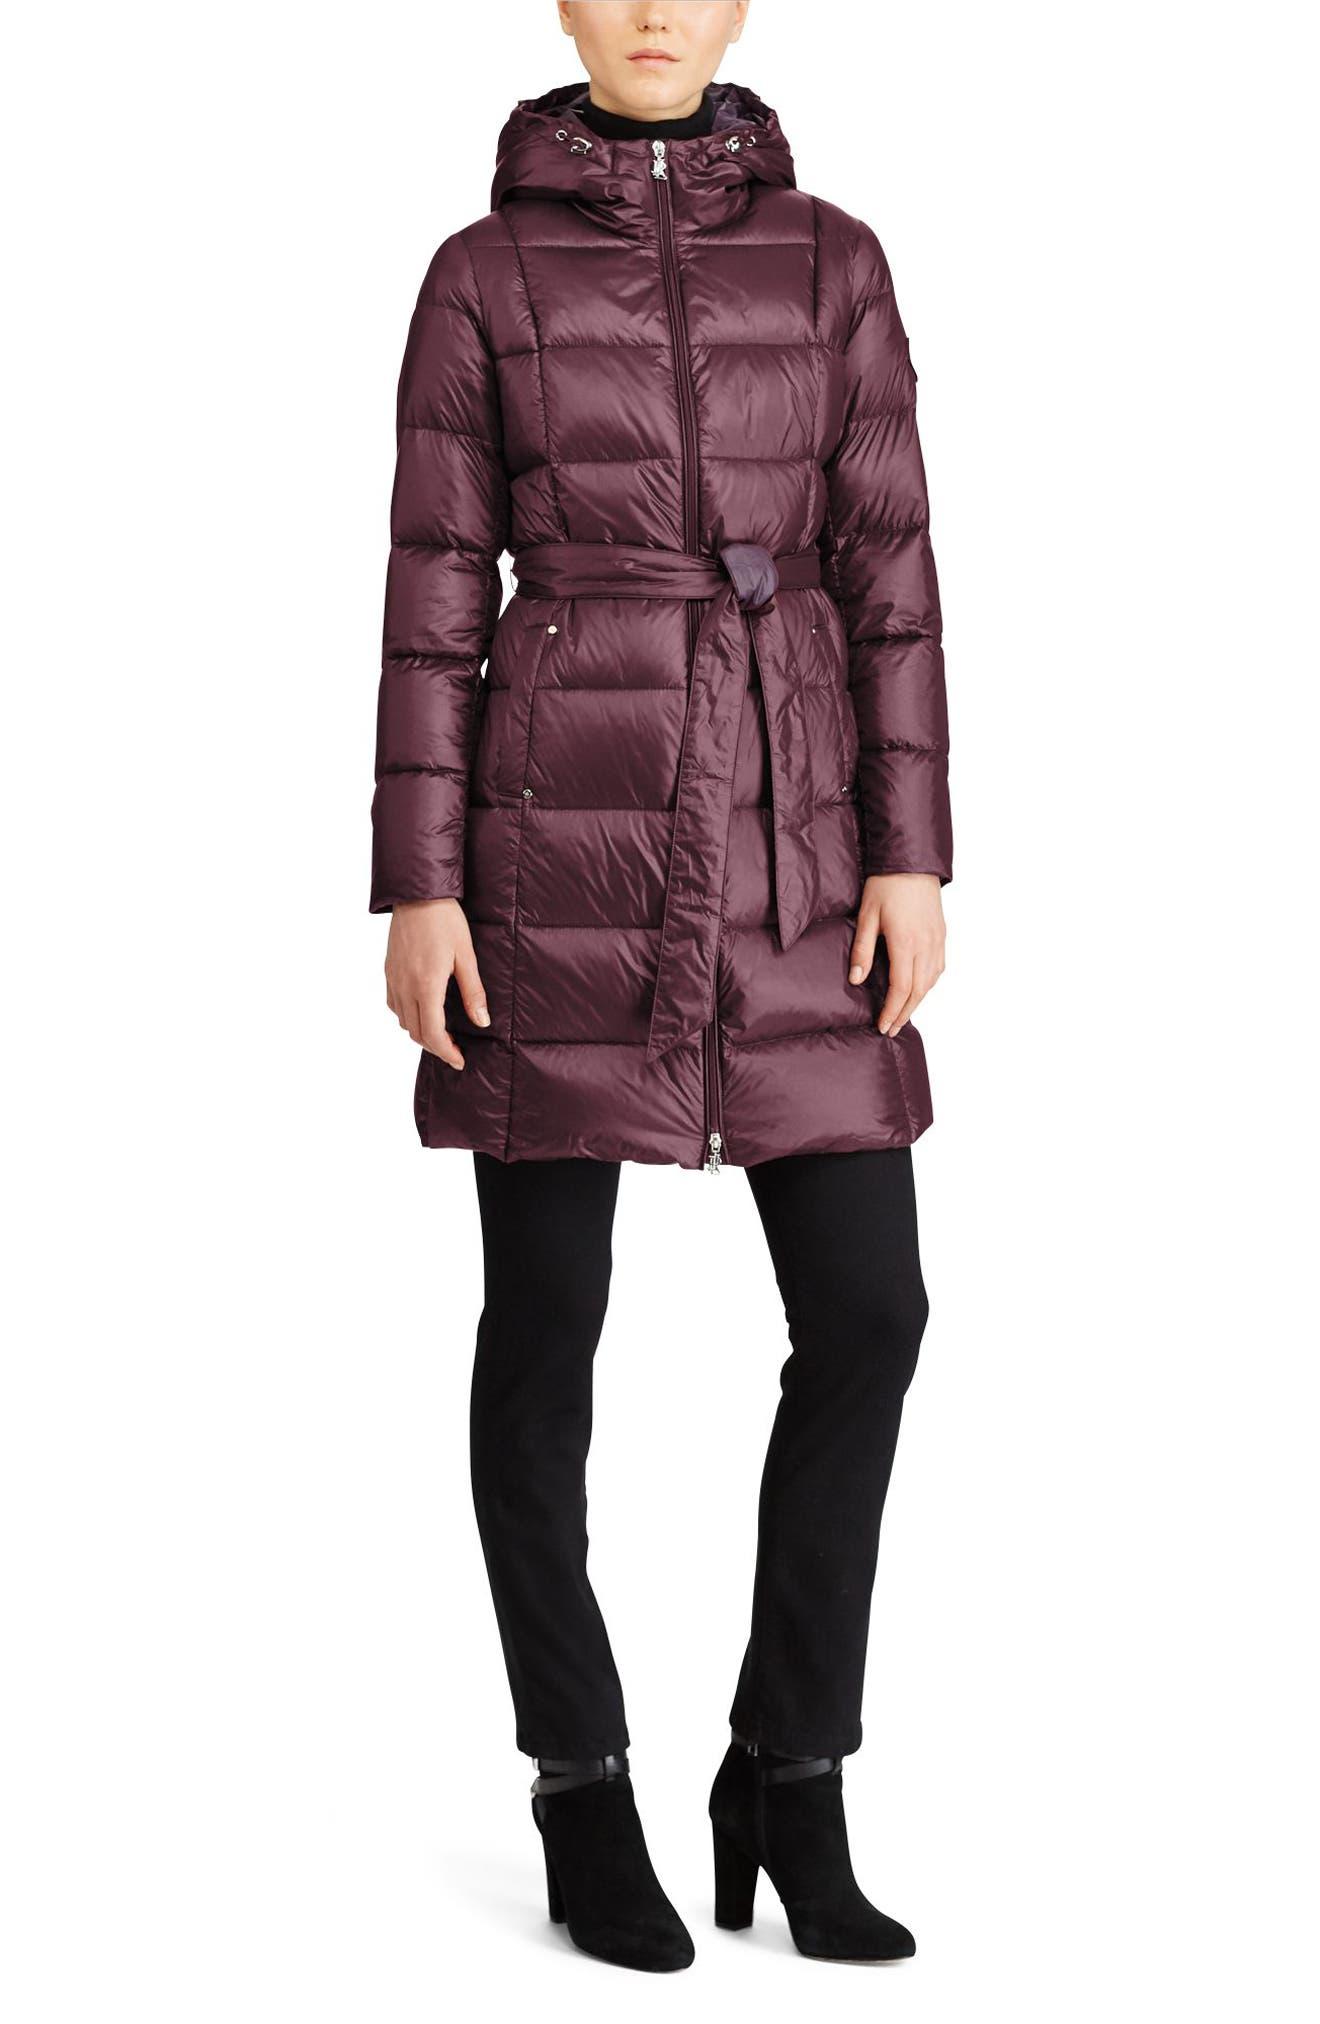 Packable Belted Down Jacket,                             Alternate thumbnail 2, color,                             Burgundy/ Aubergine